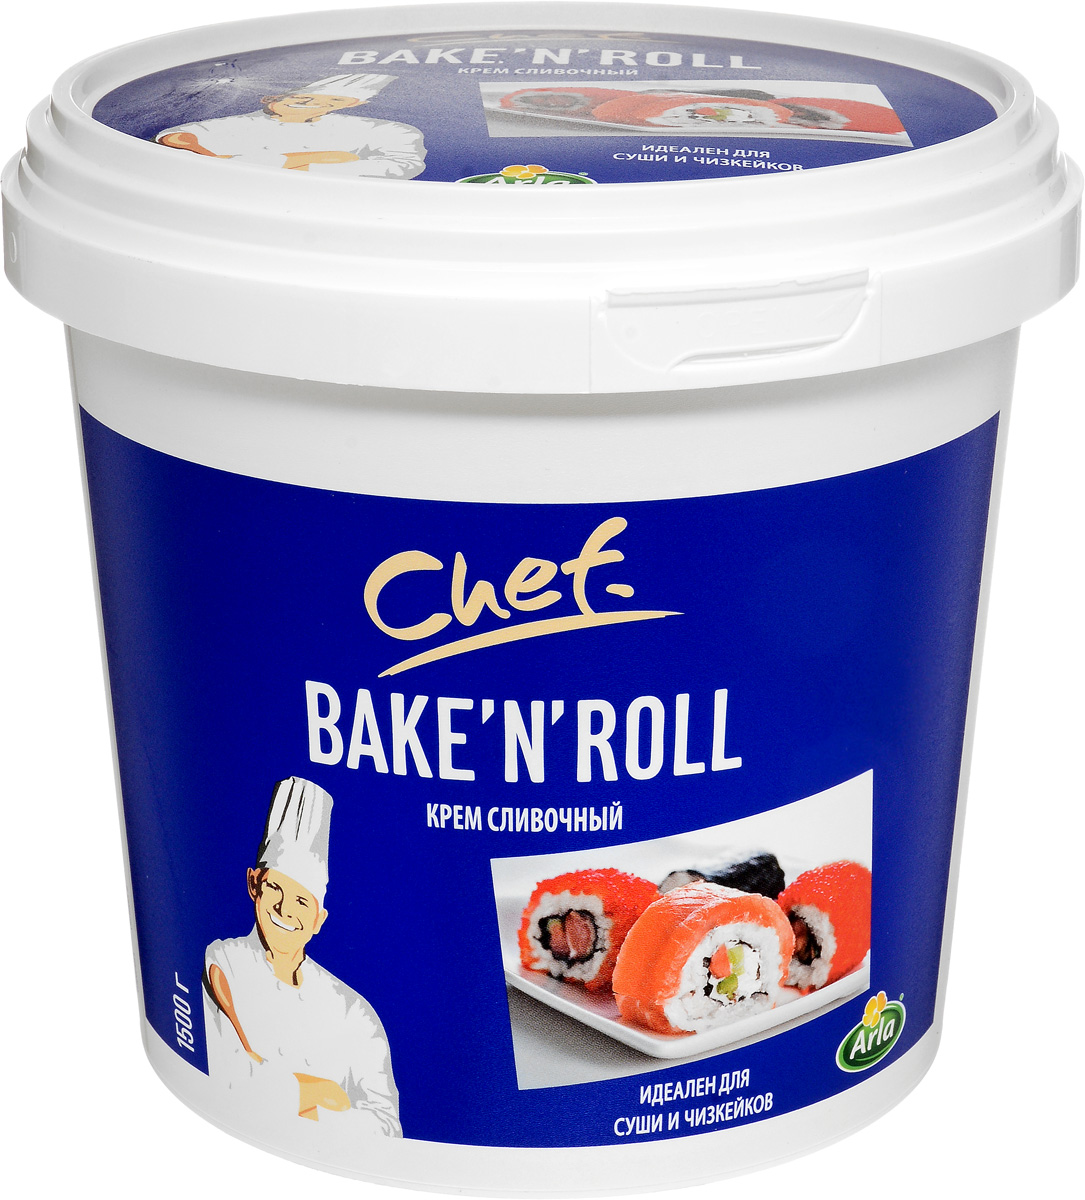 Arla Chef Bake'n'Roll Крем Сливочный, 64%, 1500 г dr oetker крем тирамису 64 г